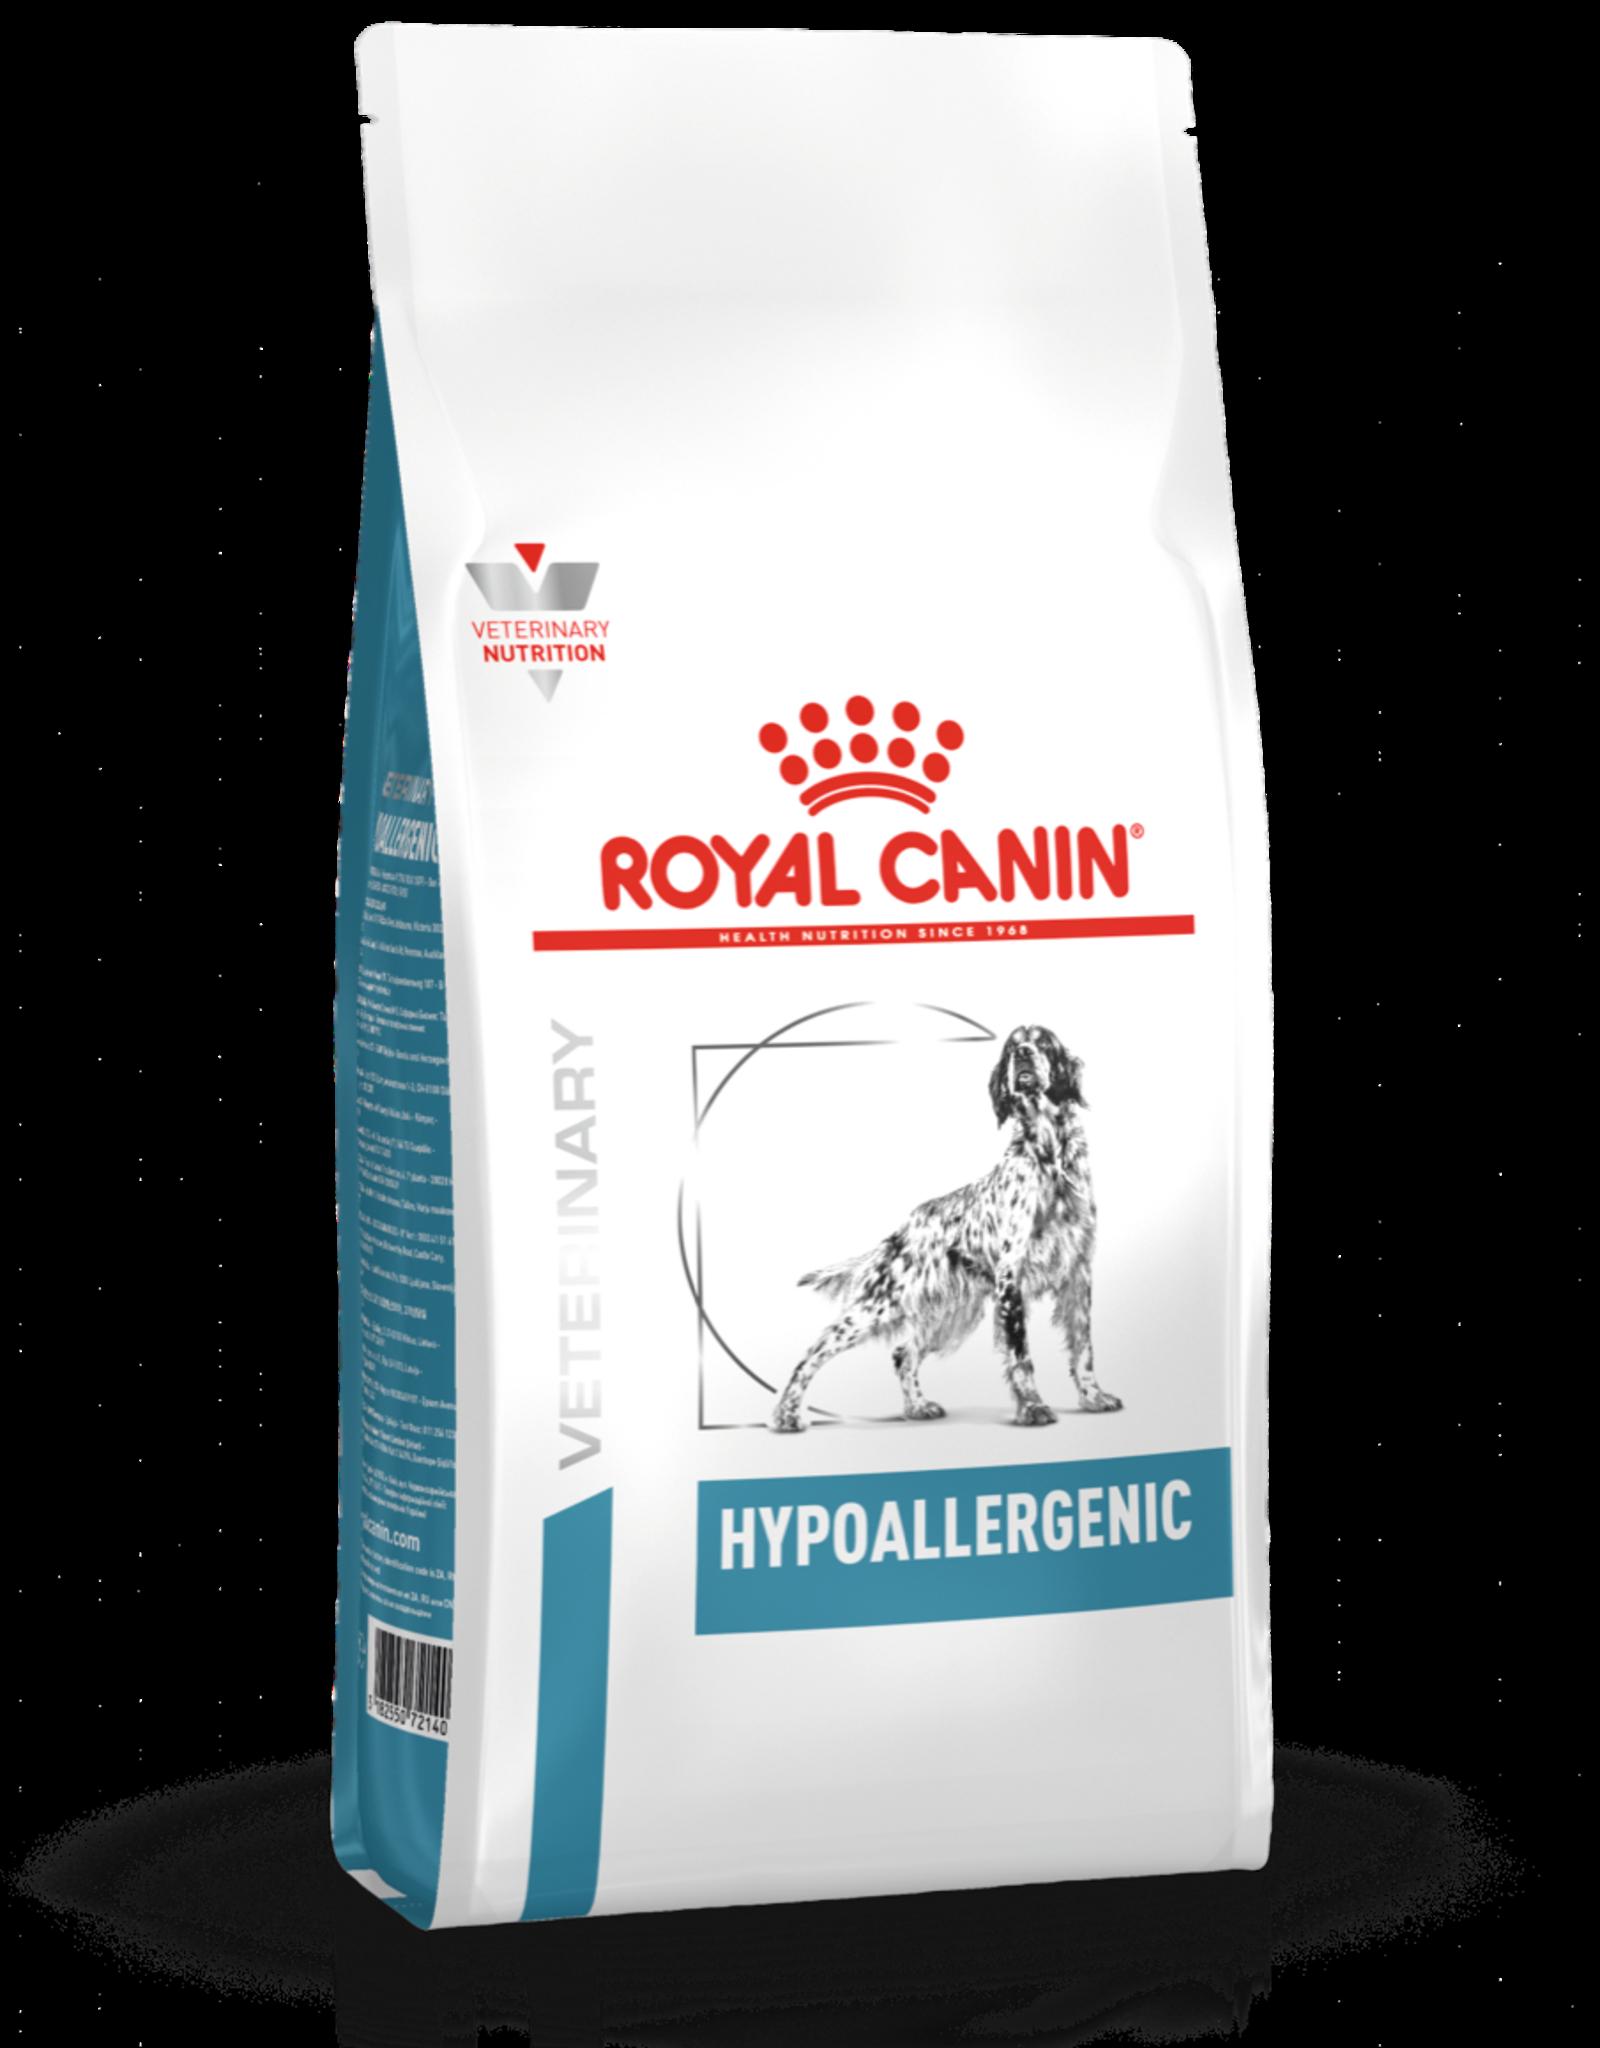 Royal Canin Royal Canin Hypoallergenic Dog 14kg